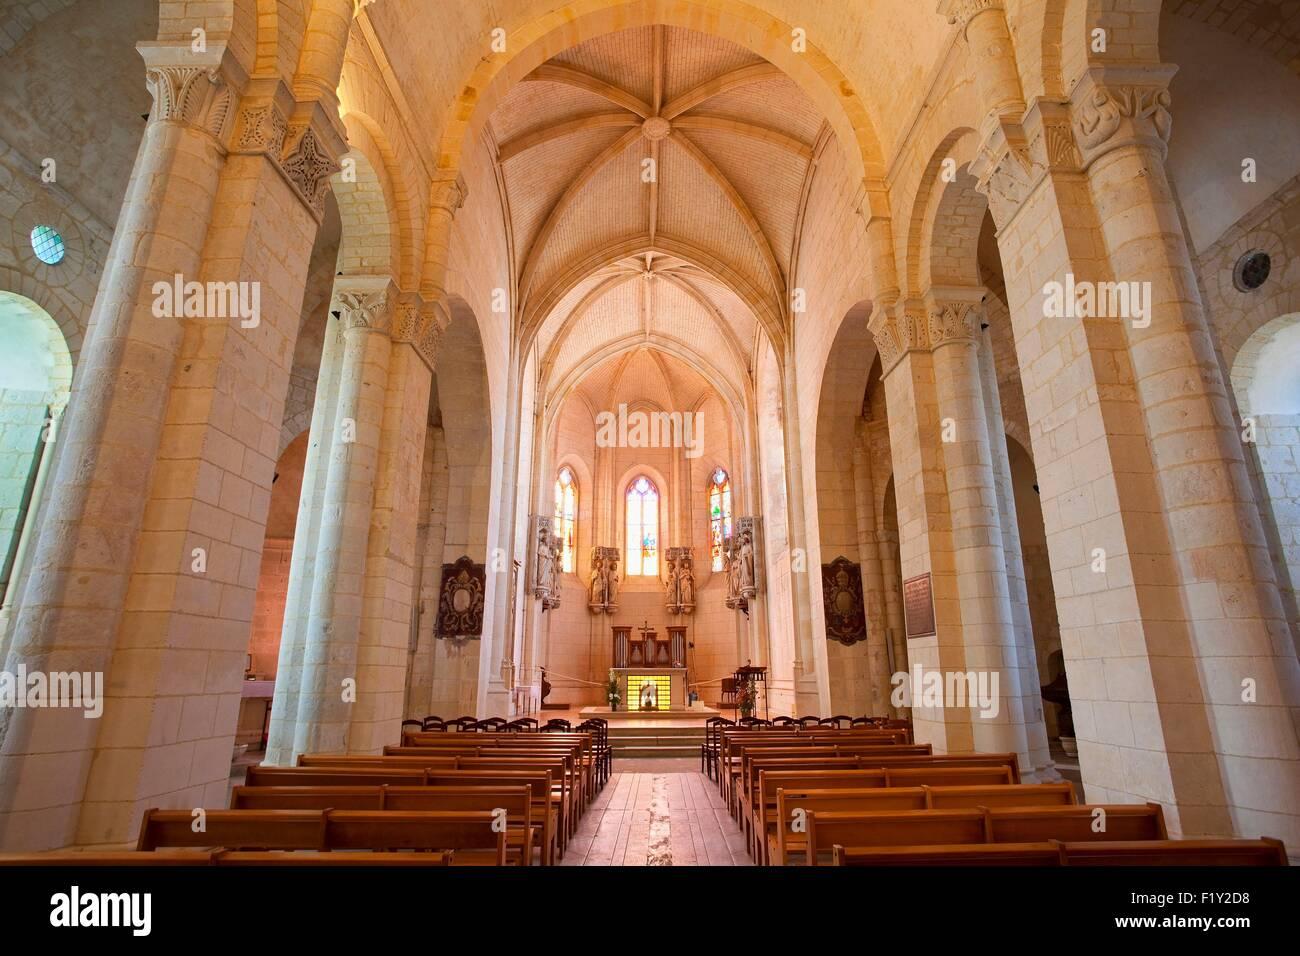 France, Charente Maritime, Saintes, Saint Eutrope basilica - Stock Image